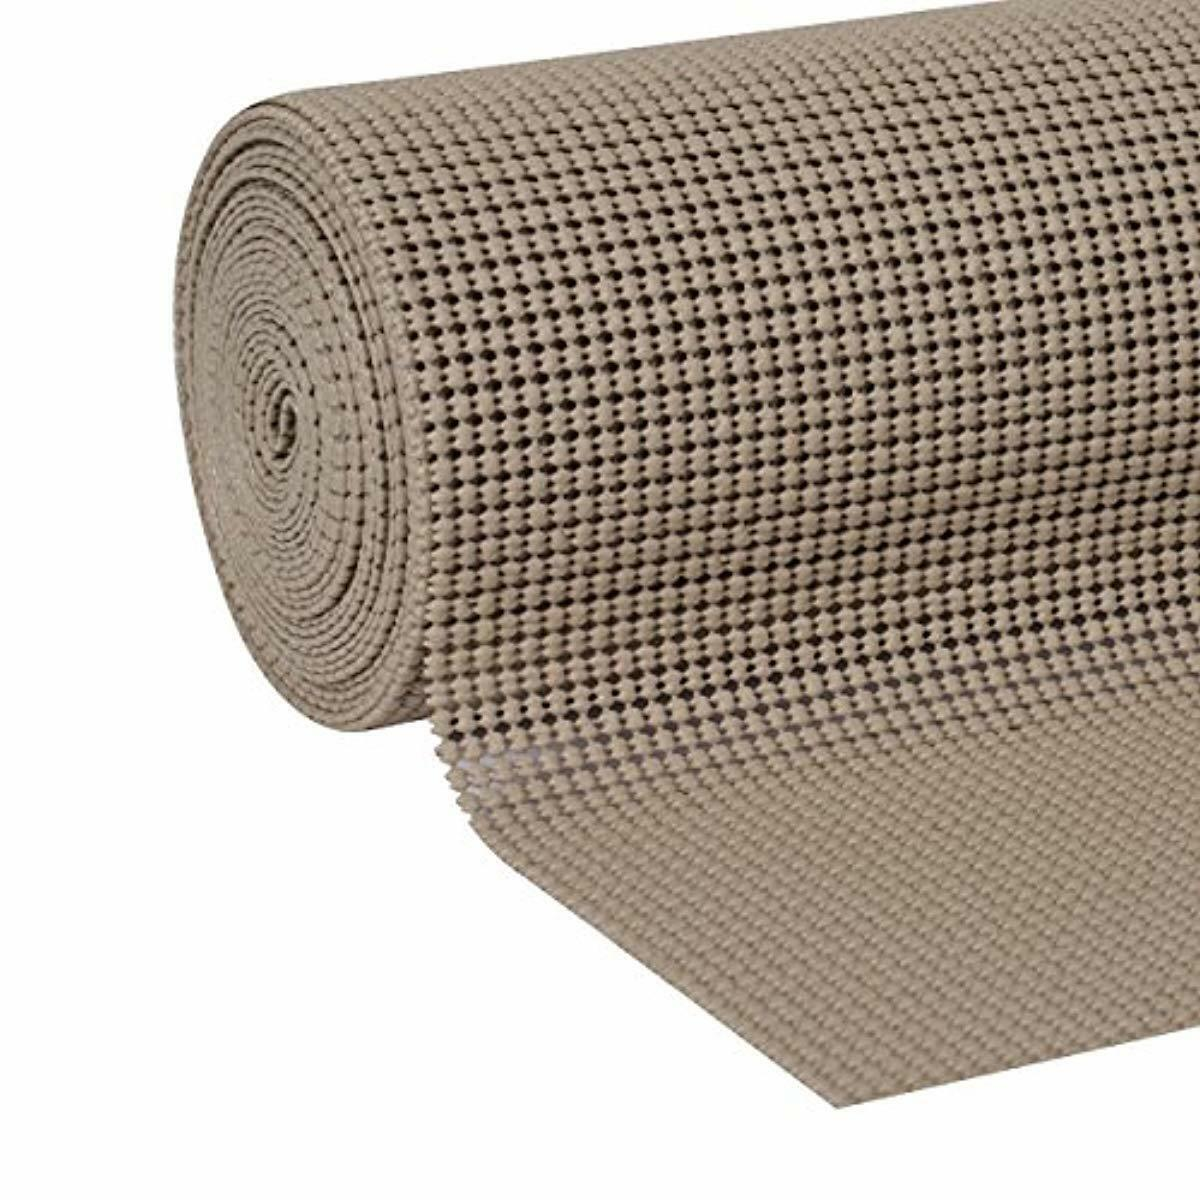 Duck Brand Select Grip EasyLiner Shelf and Drawer Liner, 12-